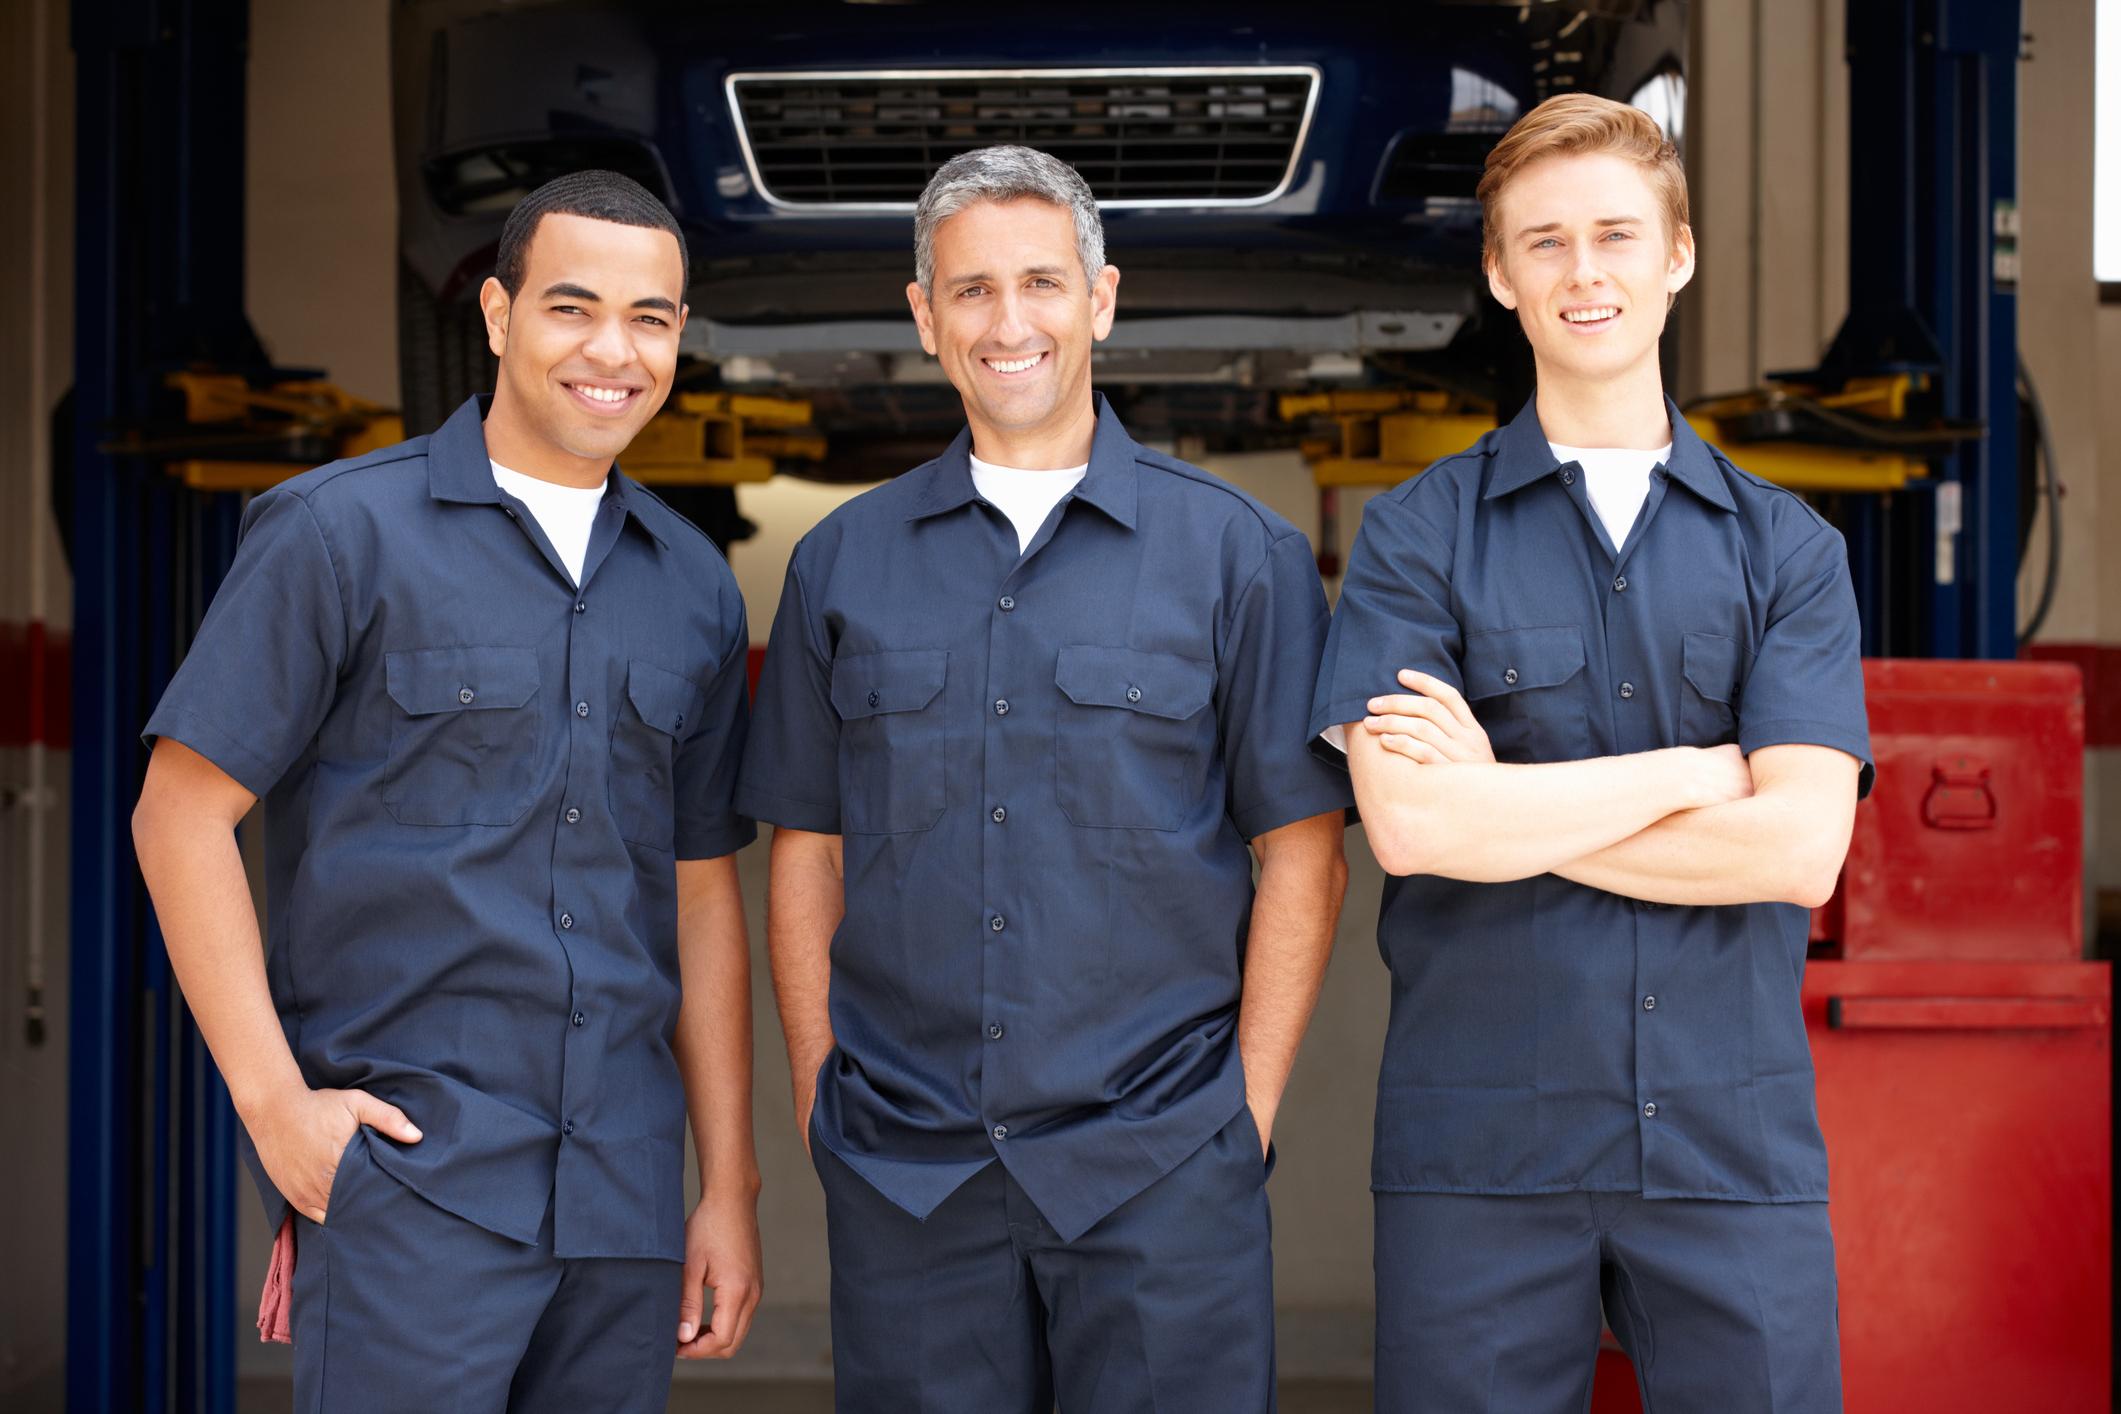 Mechanics in dark blue uniforms.